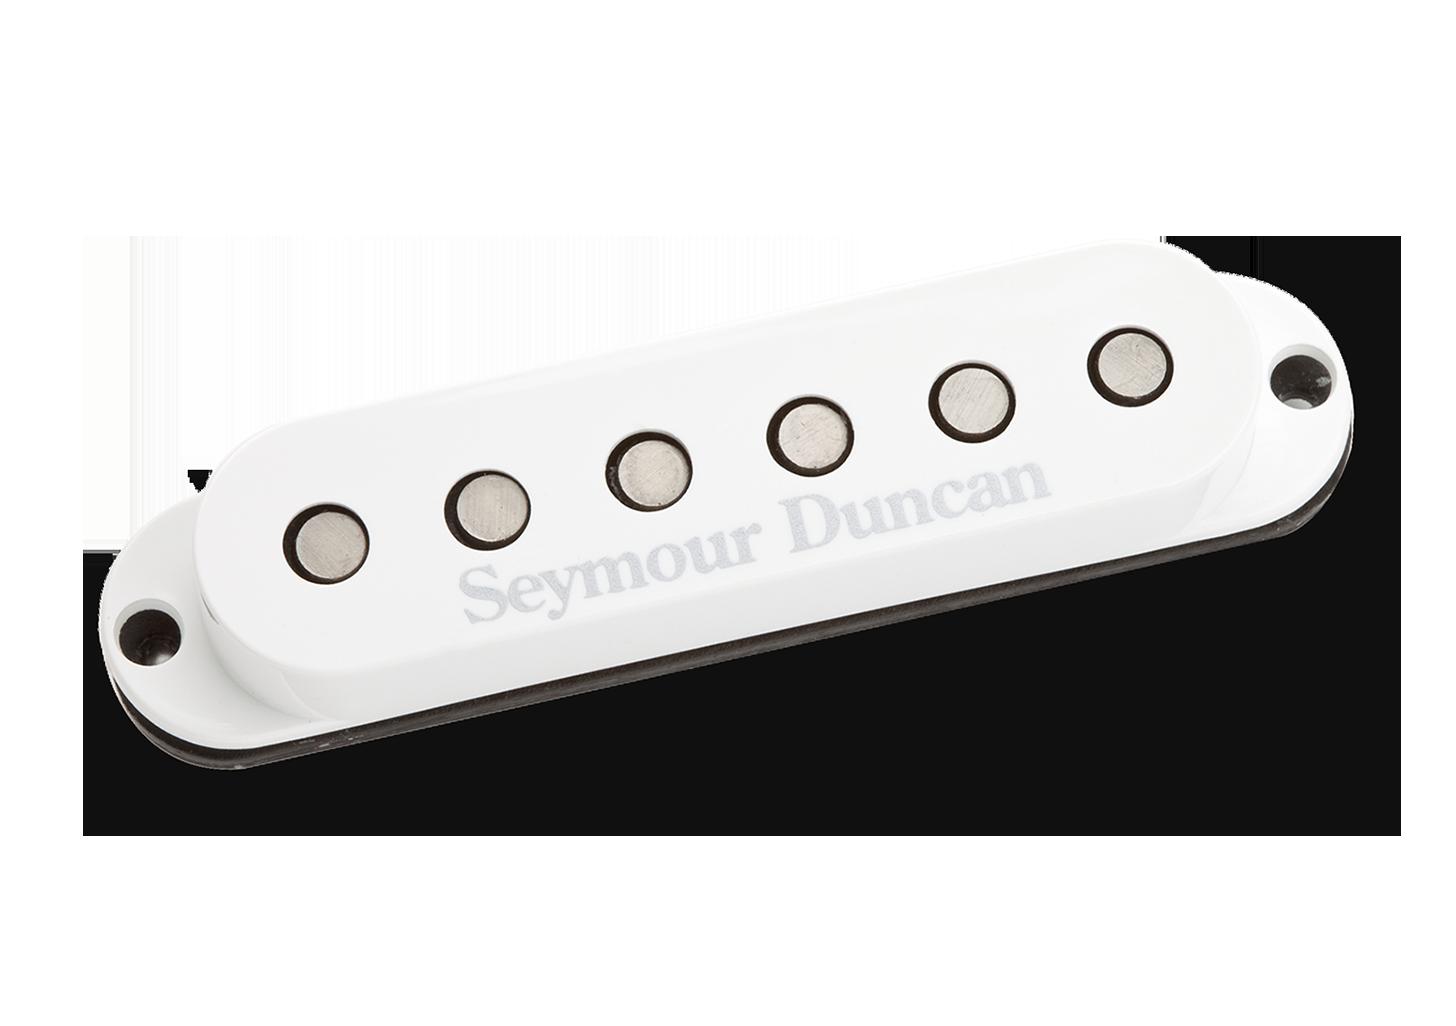 Seymour Duncan Custom Flat Strat SSL-6 RW/RP Middle